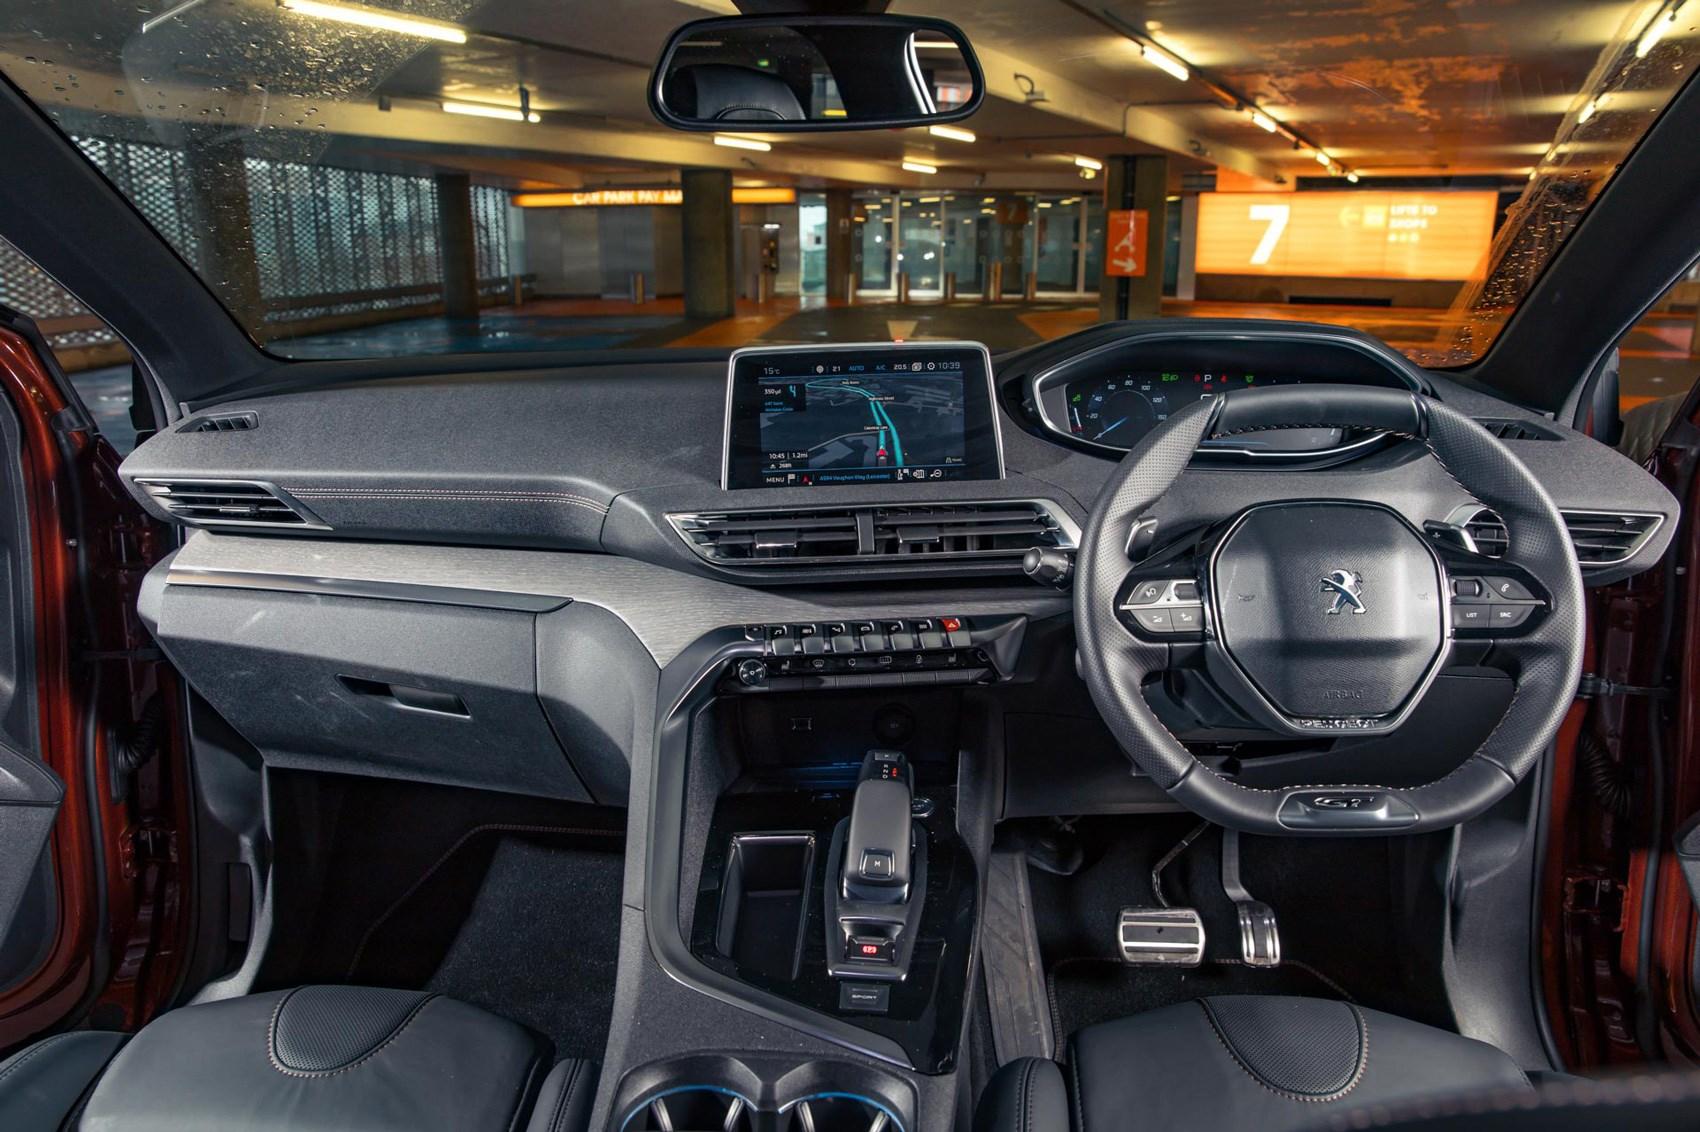 Old Mini Interior >> Renault Scenic vs Peugeot 3008 vs Seat Ateca triple test (2017) review | CAR Magazine